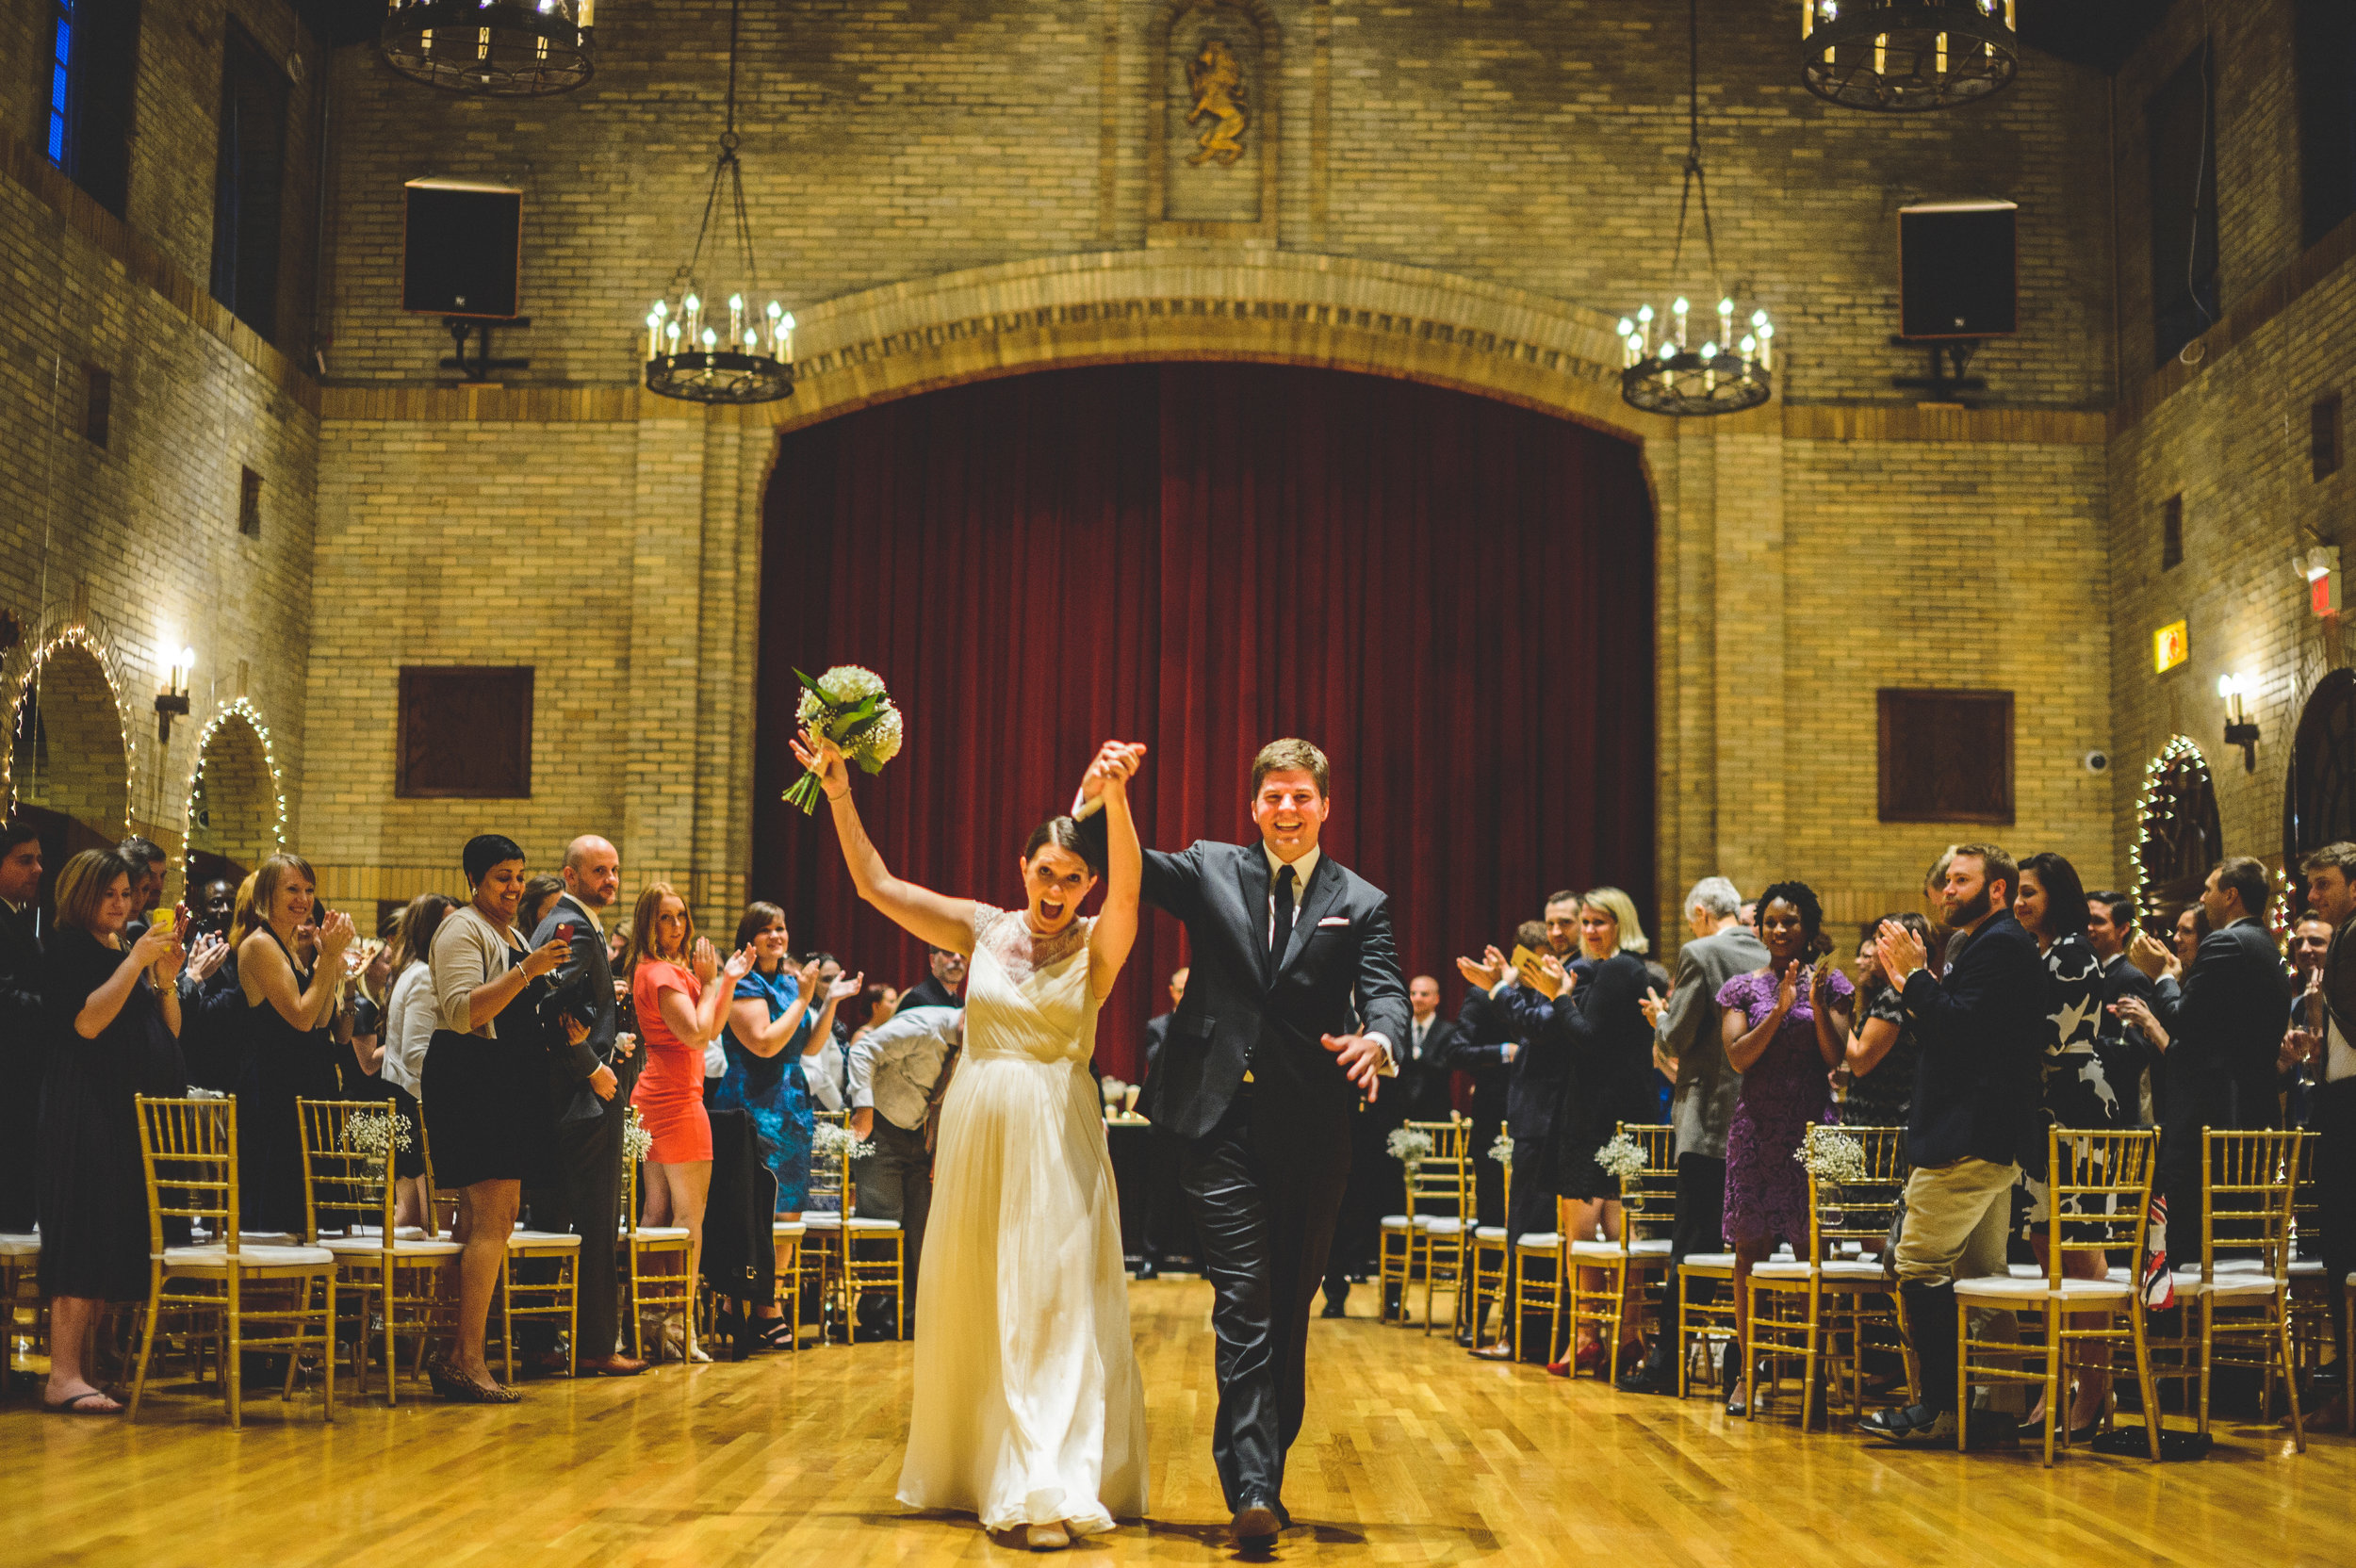 Katie and Ryan wedding franciscan monastery washington dc wedding photographer nathan mitchell-250.jpg